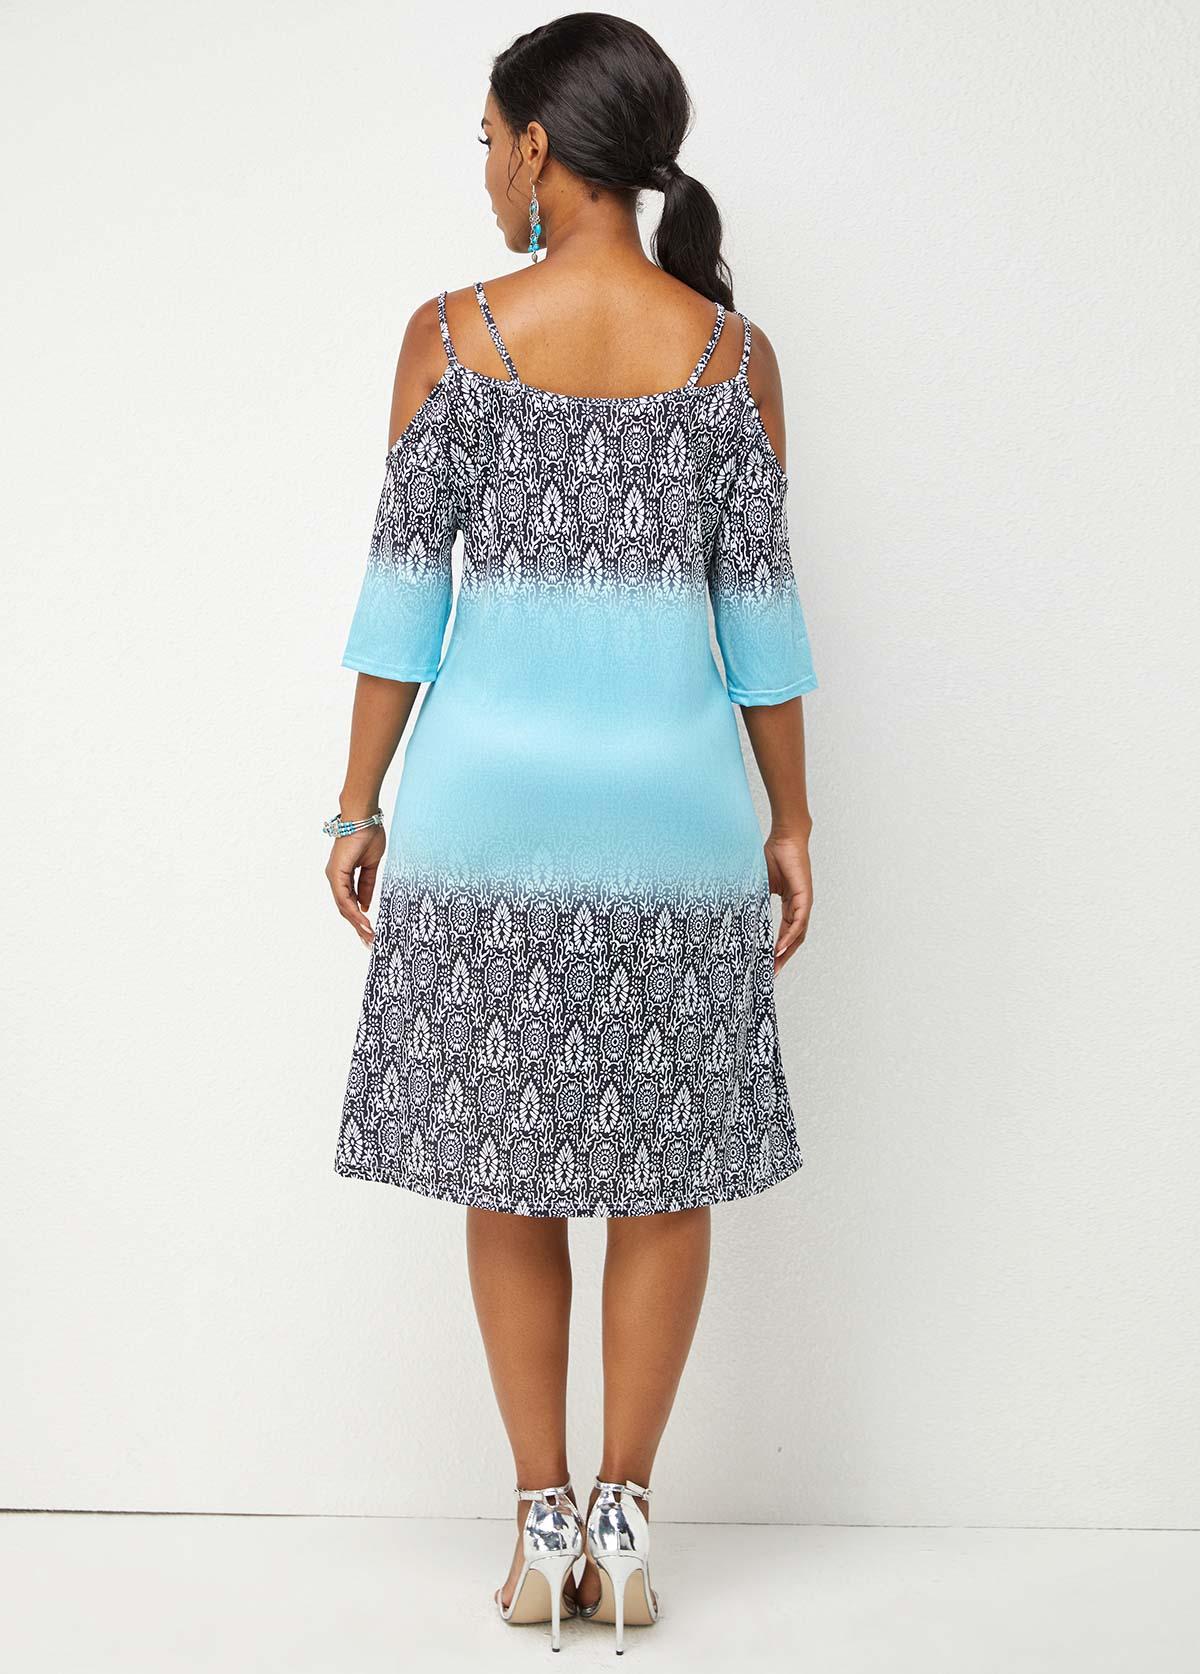 Spaghetti Strap 3/4 Sleeve Printed Dress